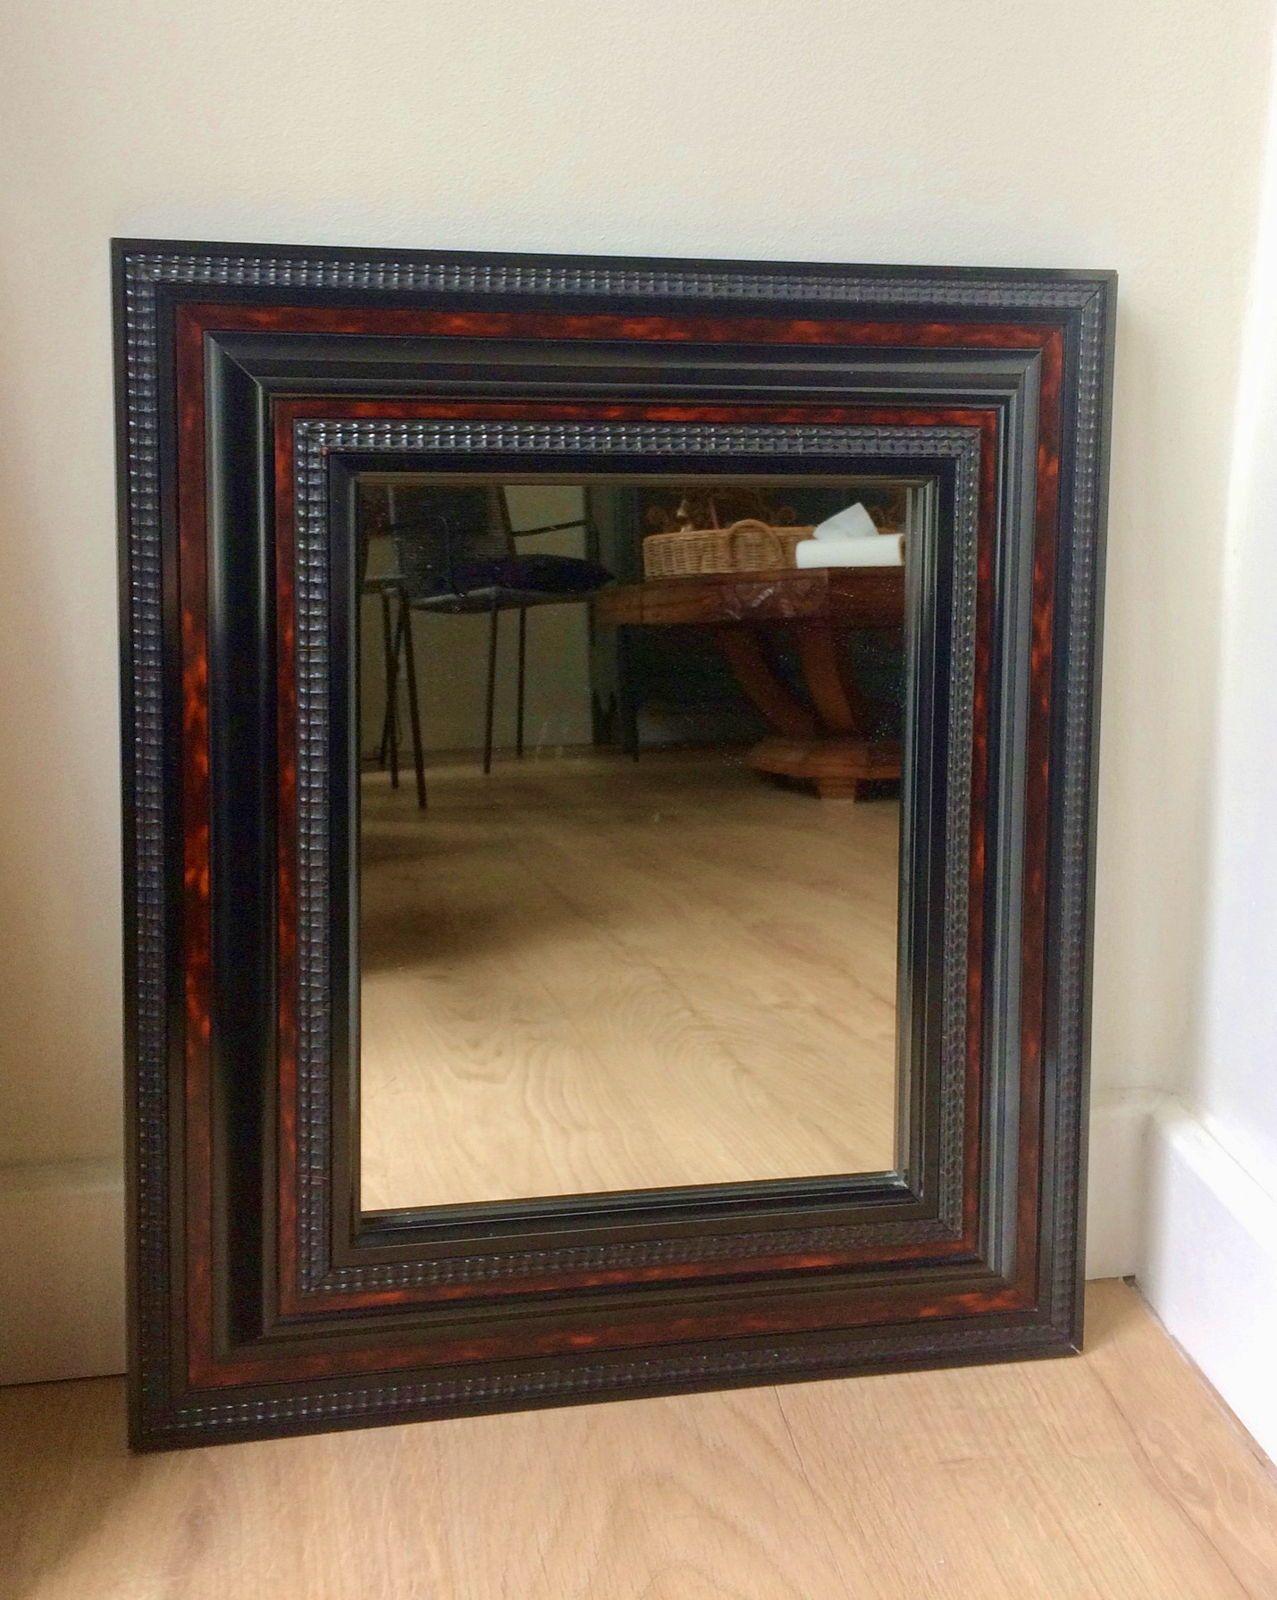 Vends miroir hollandais de belle facture